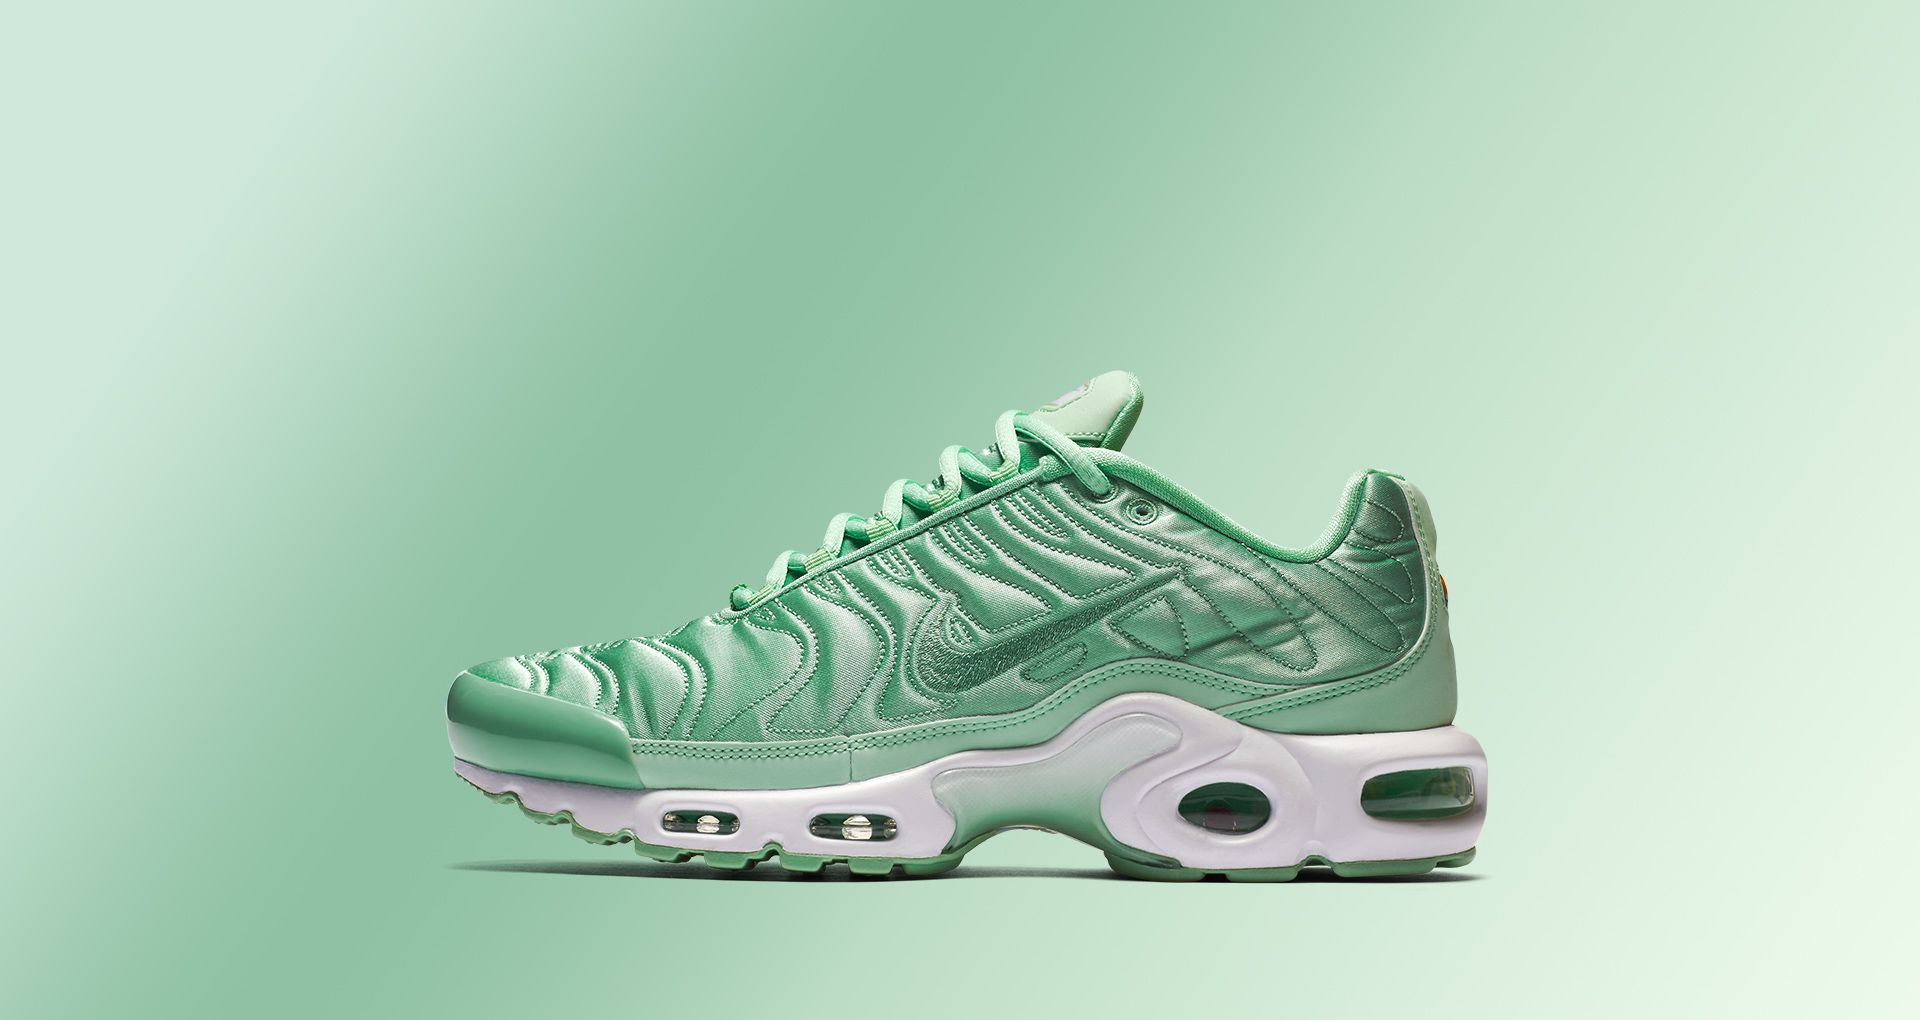 Satin' Women's Nike Air Max Plus 'summer MintNike mnyOvN0w8P